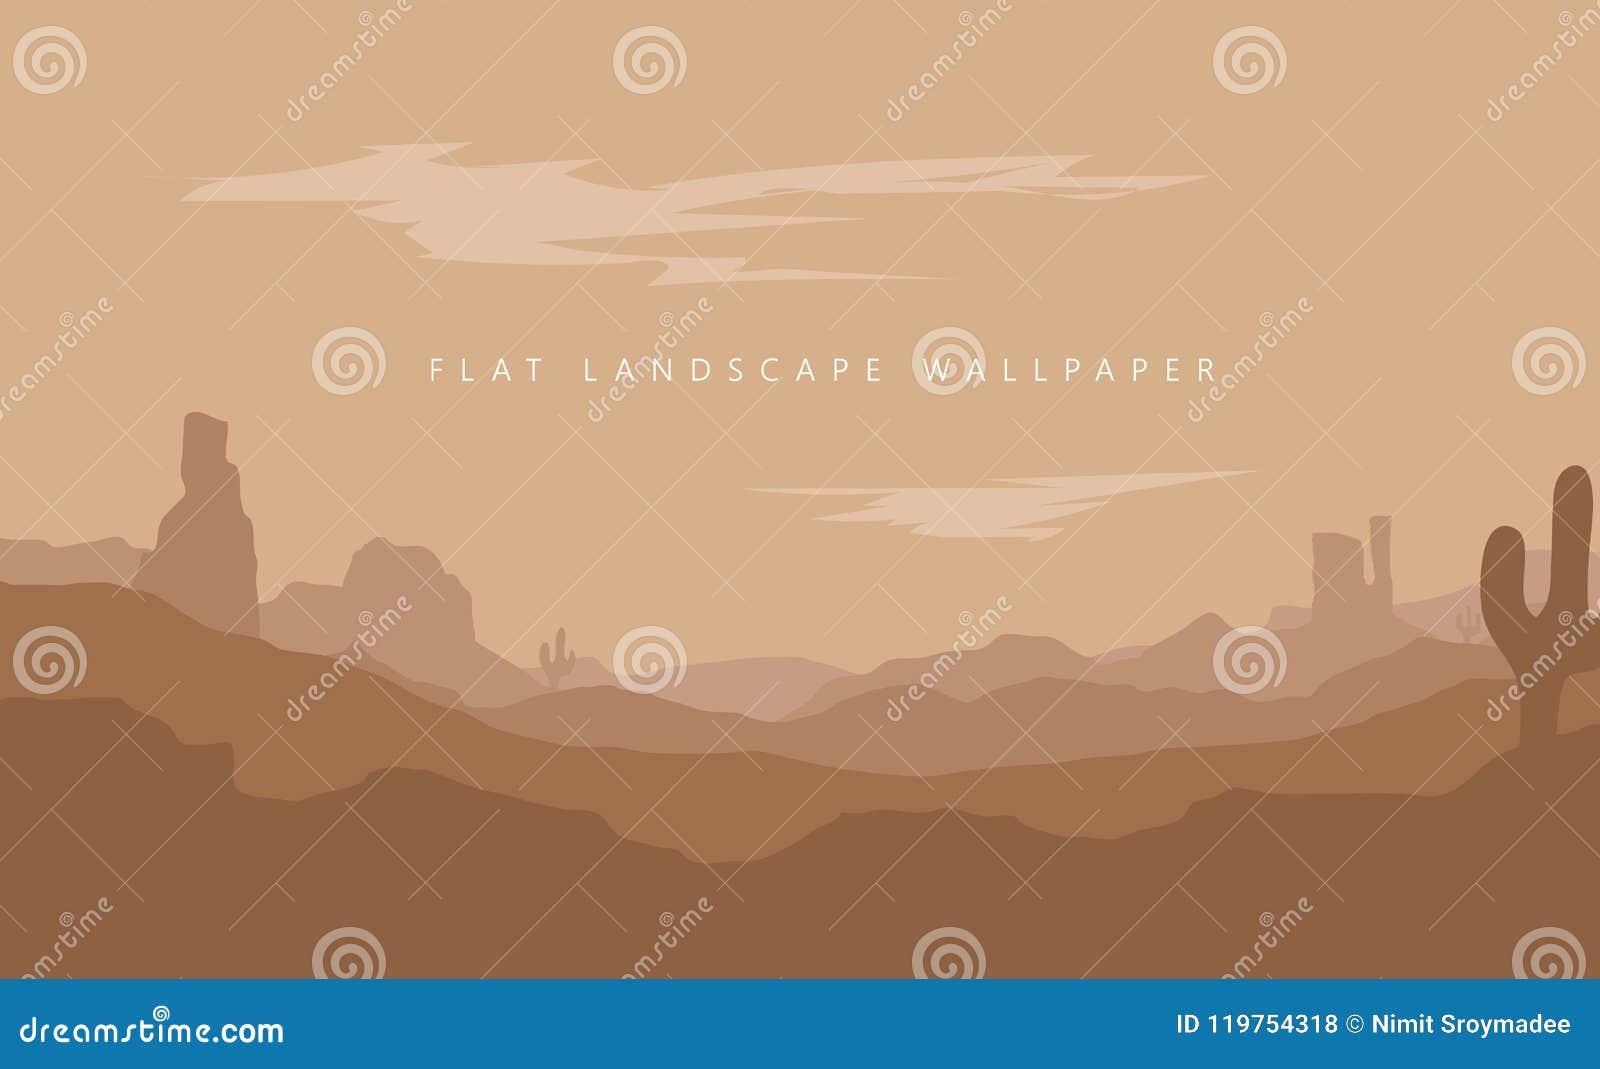 Flat Landscape Mountain Desert Background Vector Wallpaper Stock